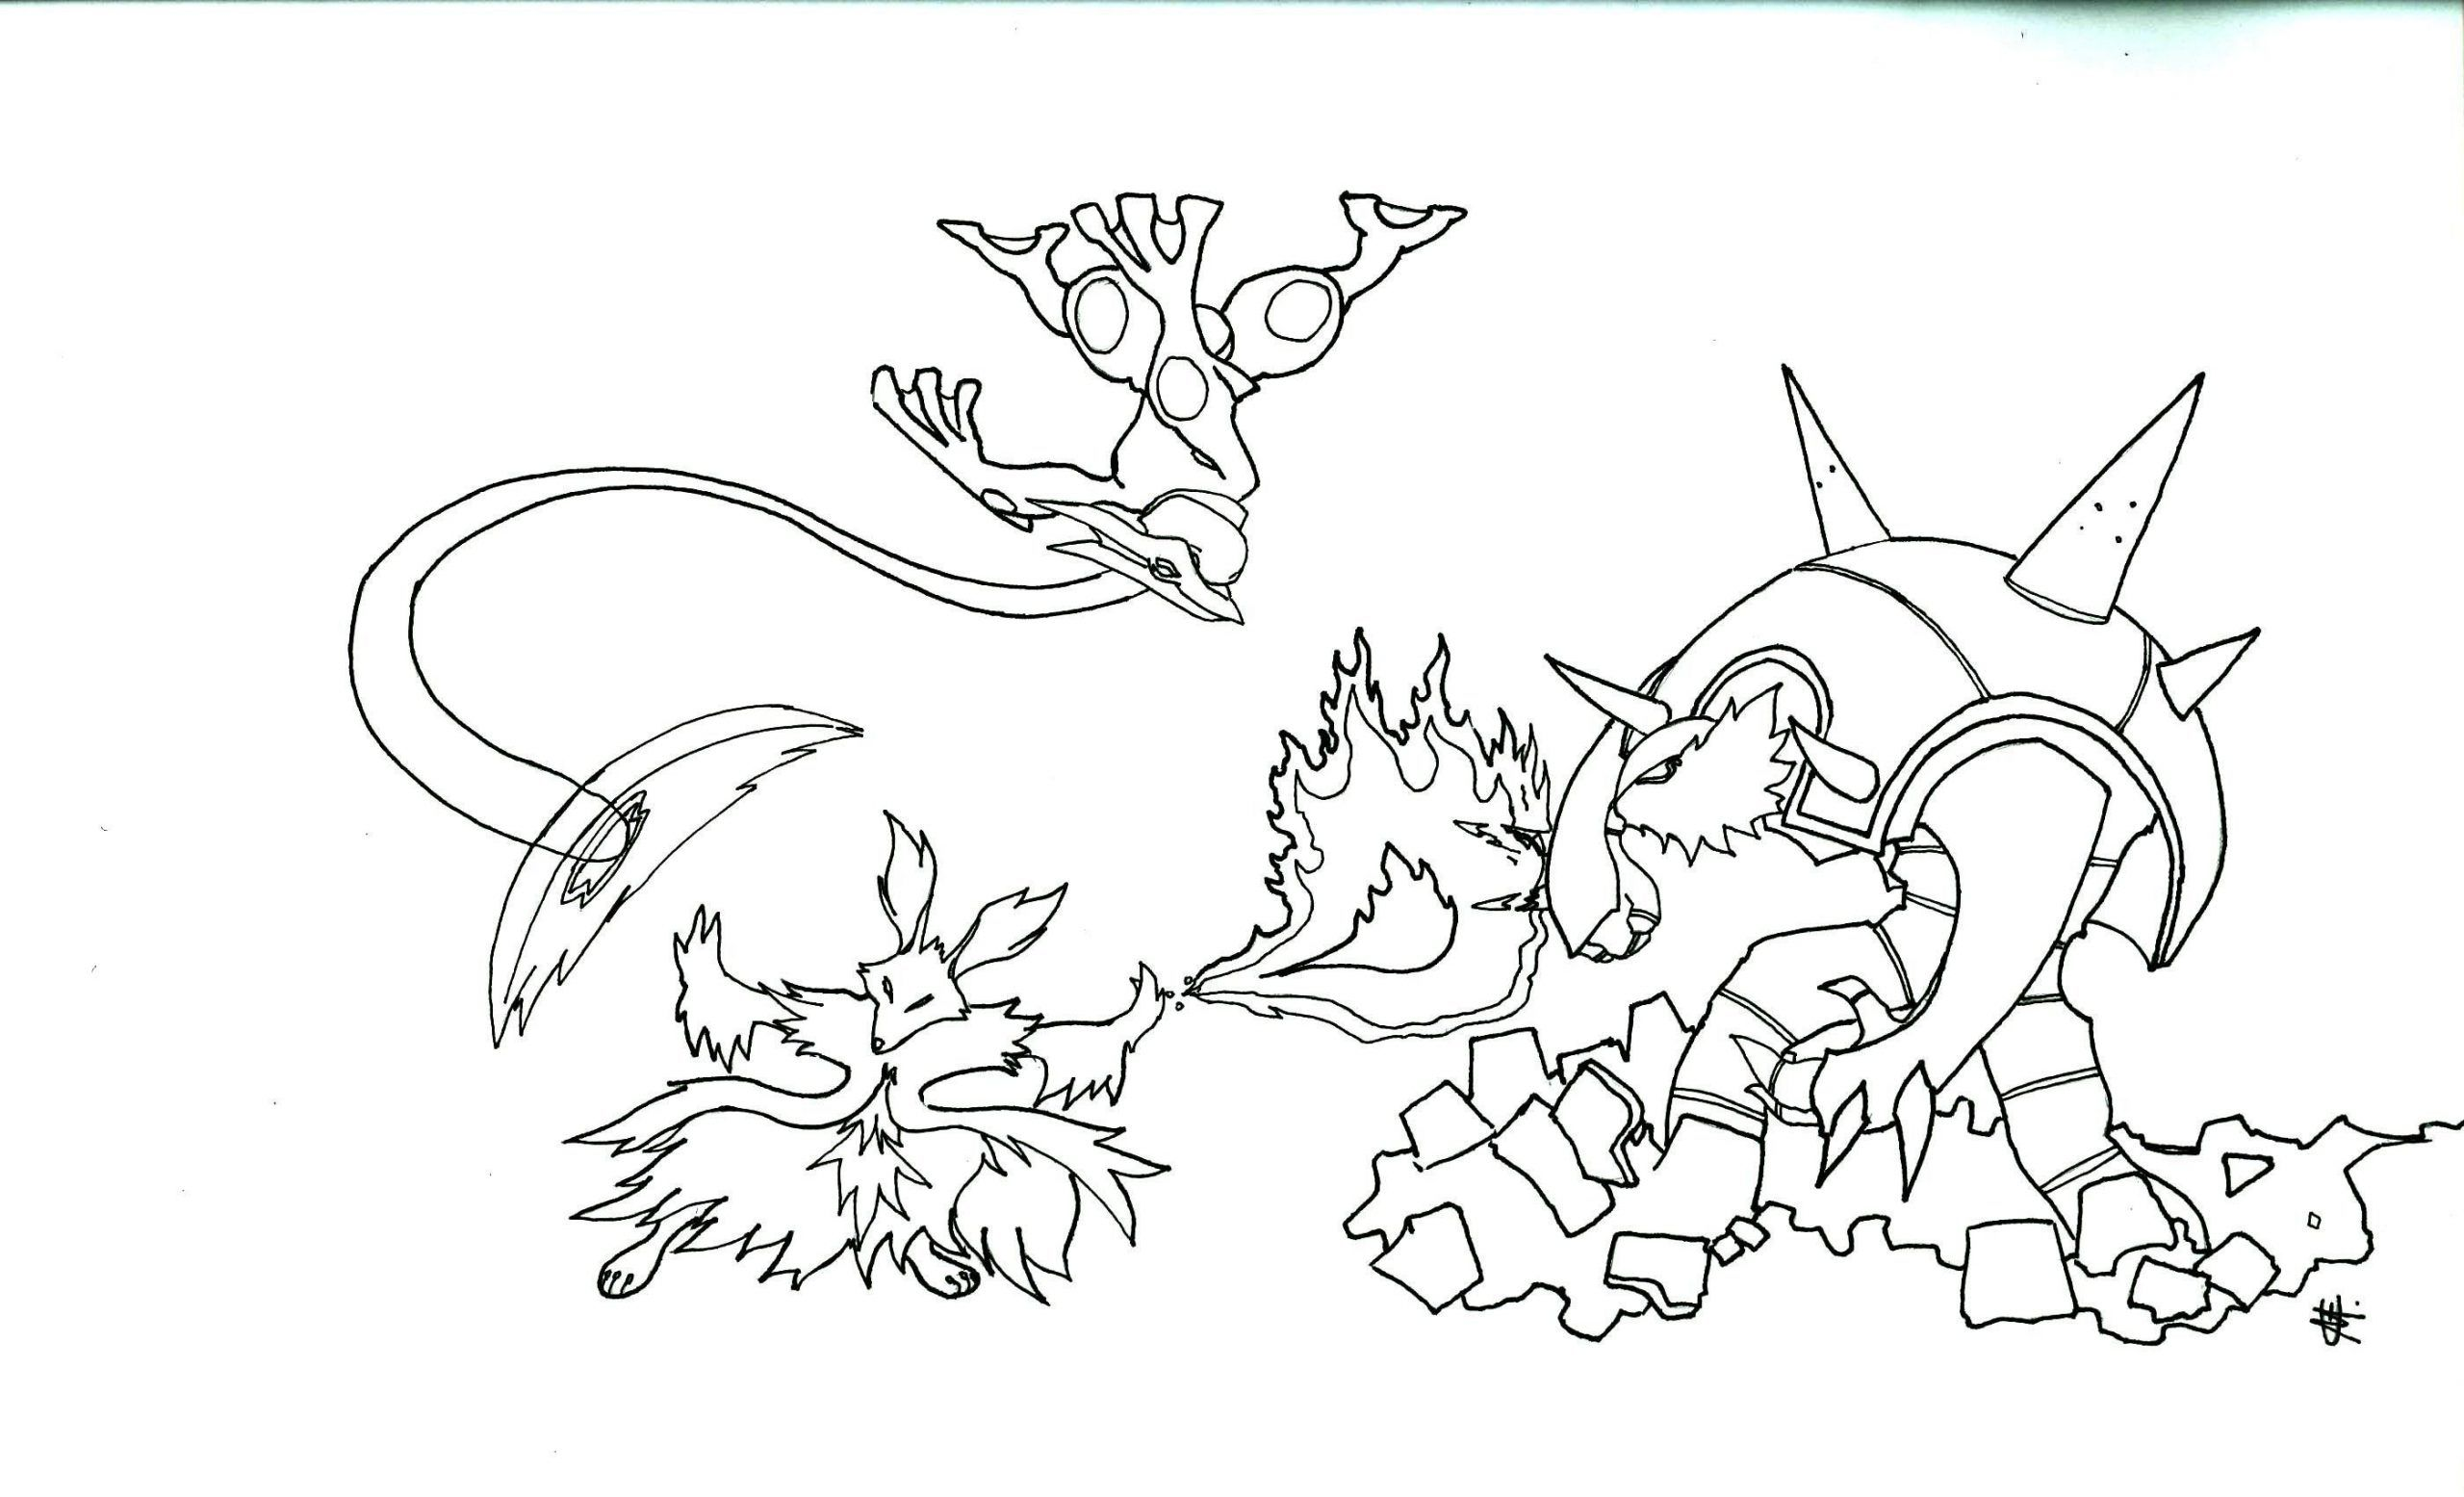 11 Mega Pokemon Coloring Pages Eevee Evolutions Diy Best Coloring Pages For Kids Halaman Mewarnai Pokemon Gambar